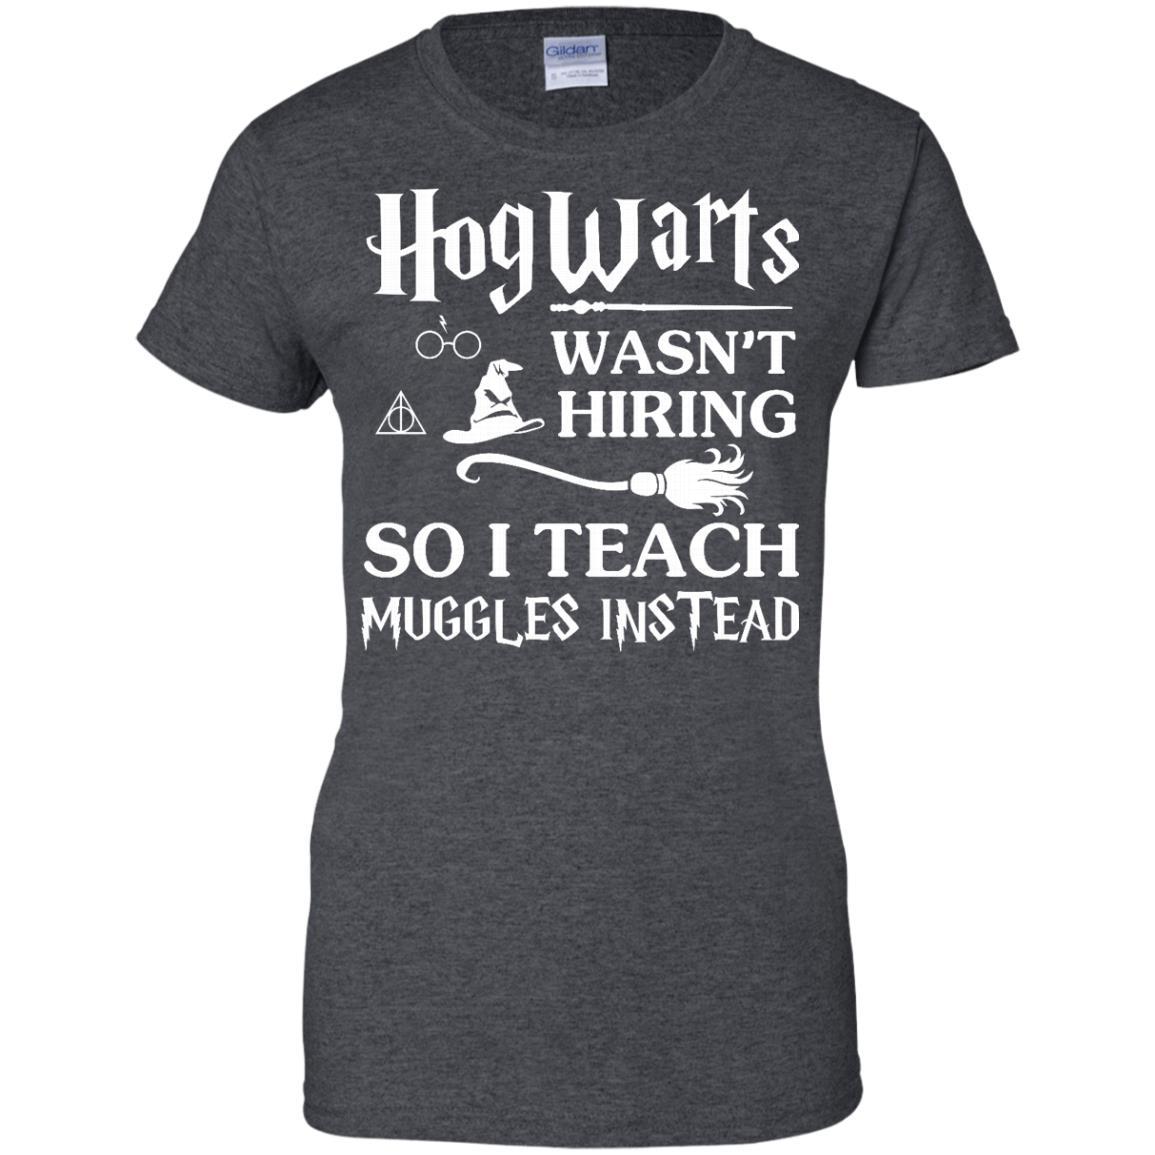 image 279px Hogwarts Wasn't Hiring So I Teach Muggles Instead T Shirts, Hoodies, Tank Top